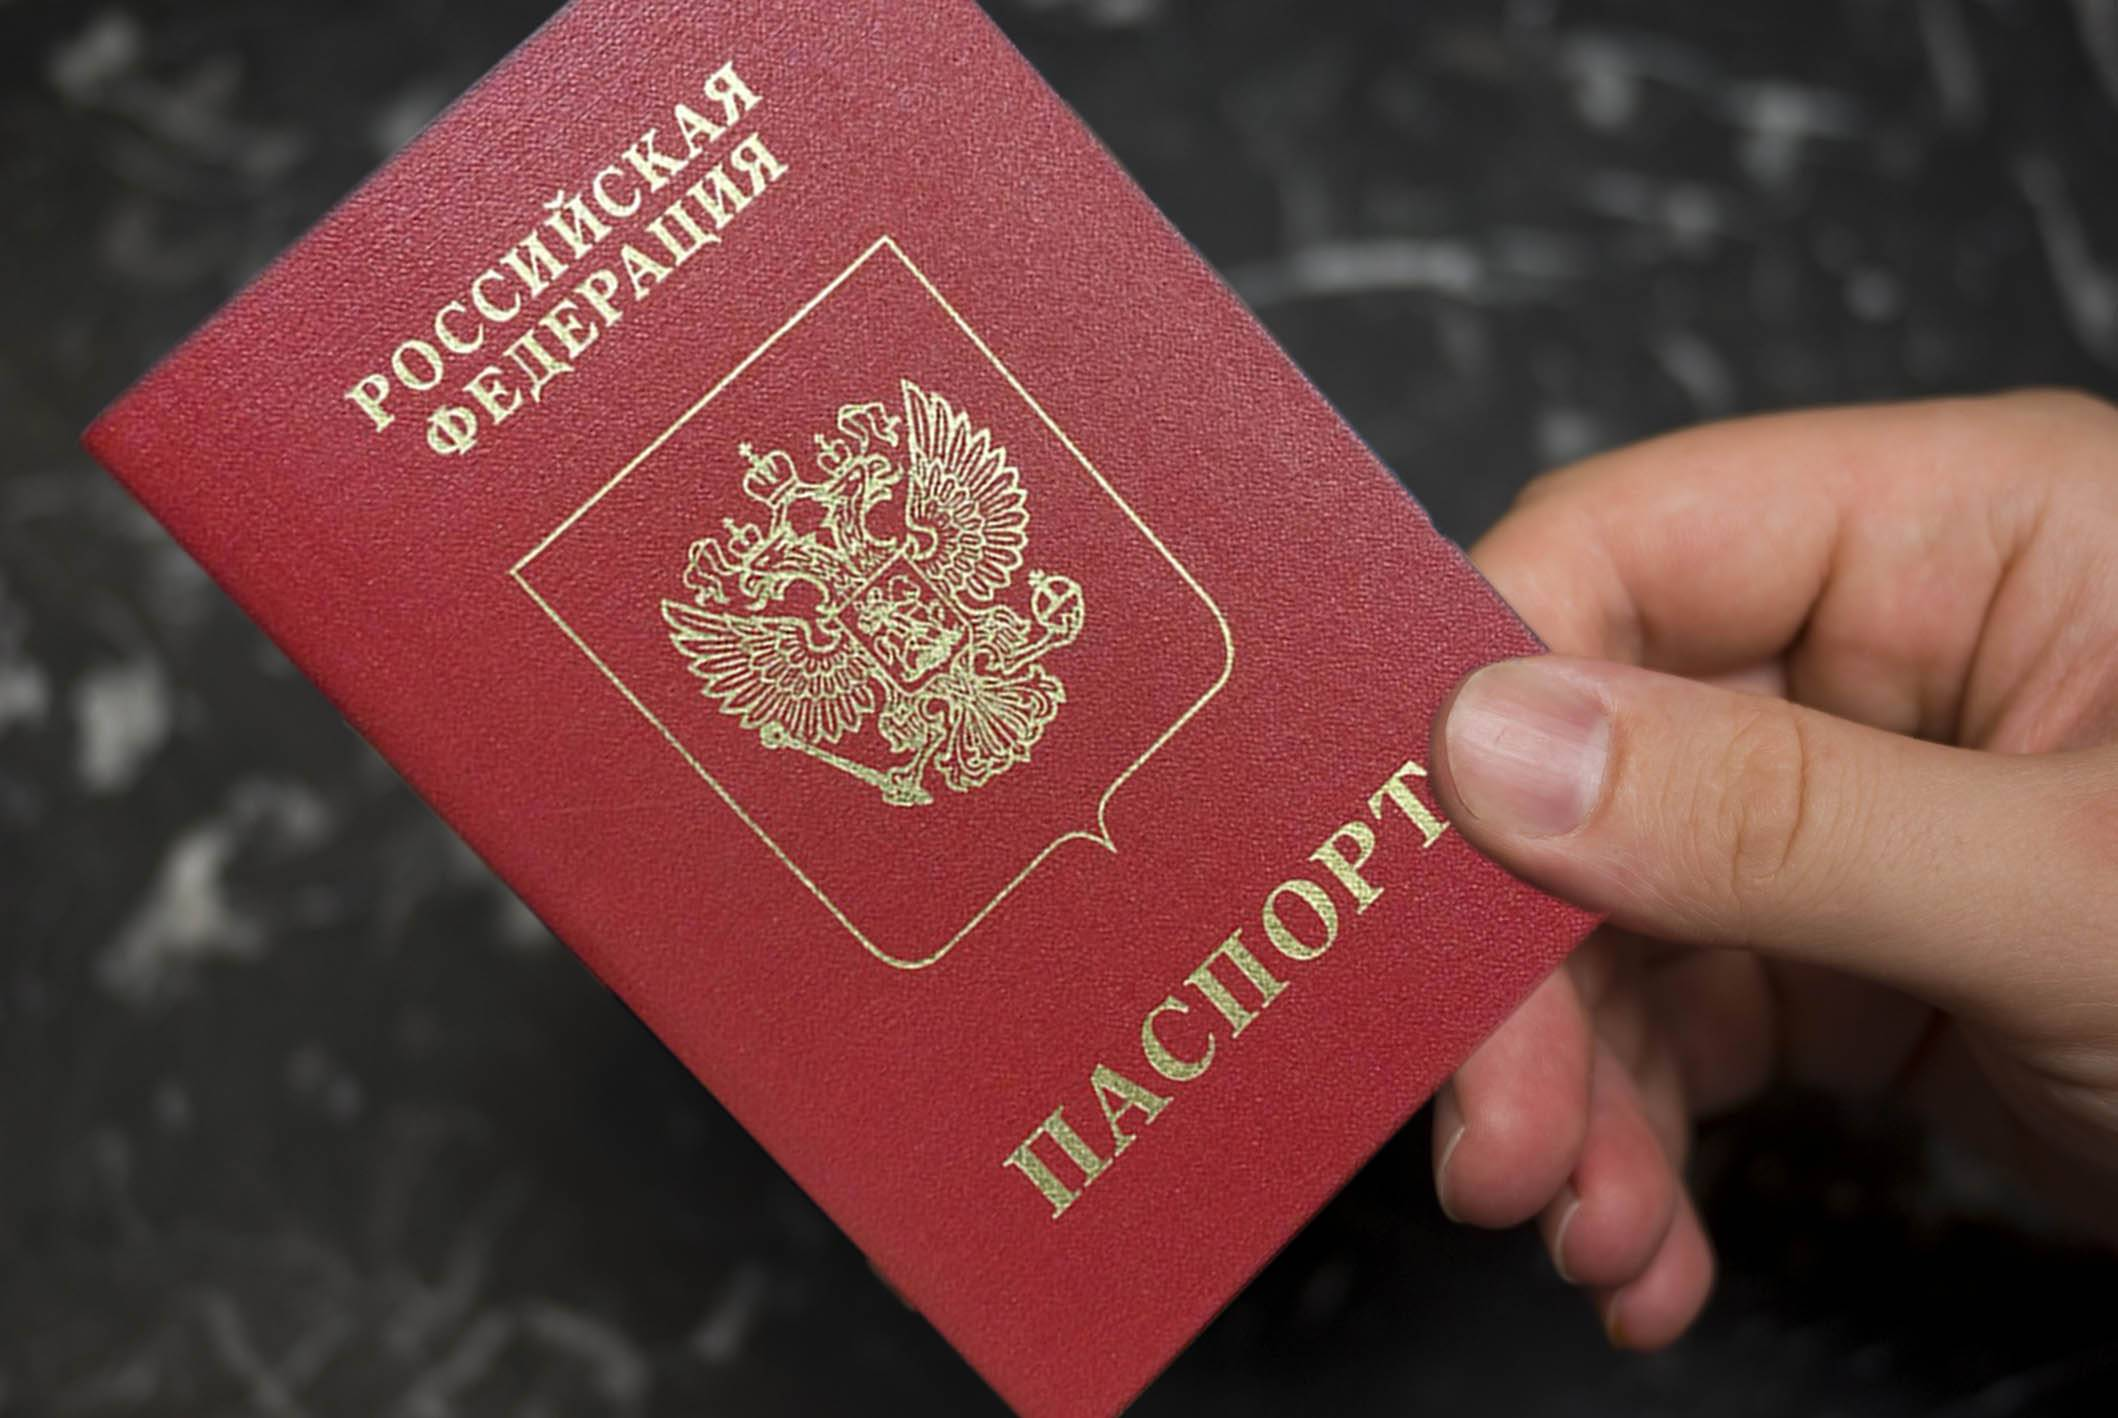 Сервис проверки паспортов фмс